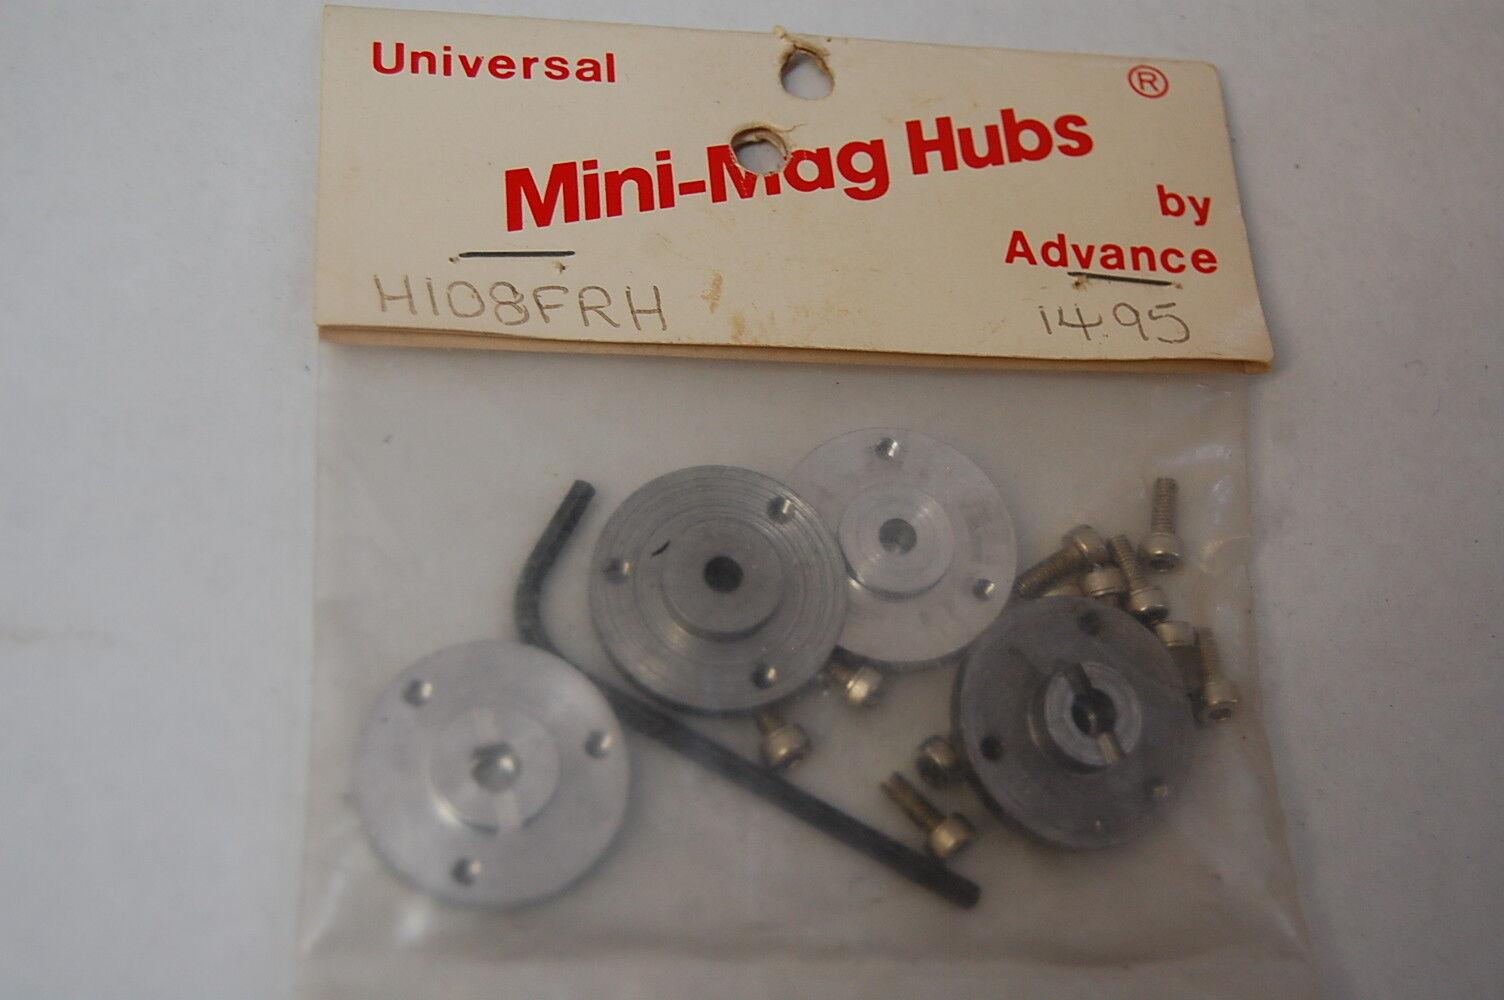 Mini Mags Advanced Engineering  Vintage Set H108FRH Aluminum Hubs,